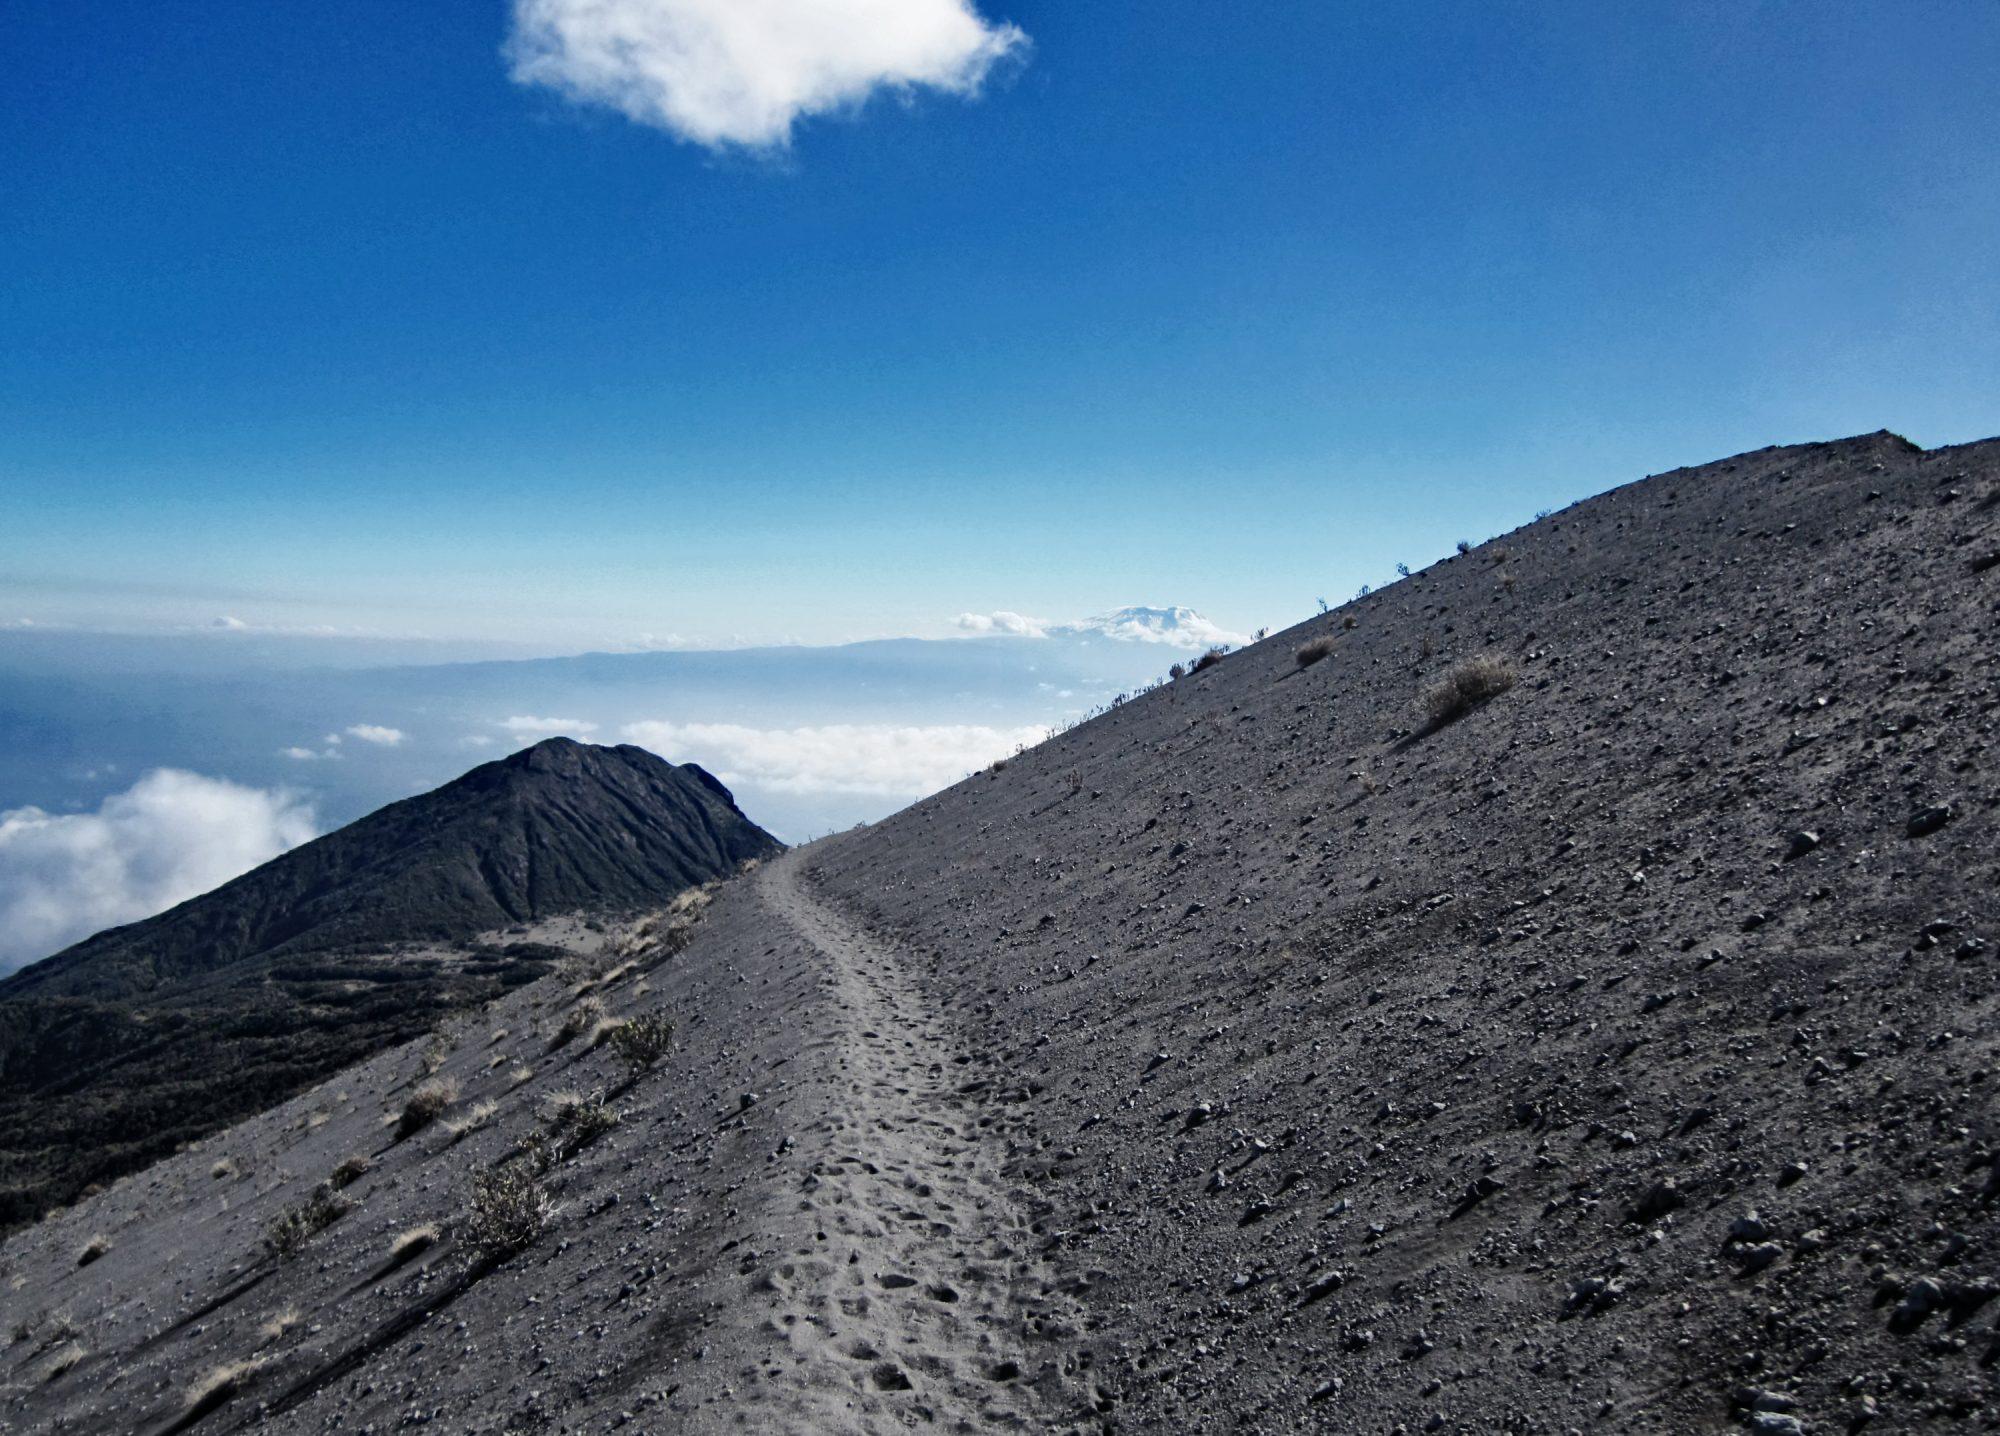 Wanderweg am Mount Meru mit Kilimandscharo Blick Mount Meru, Mount Meru Besteigung, Tour, Erfahrungsbericht, Afrika, Tansania, Bergtour